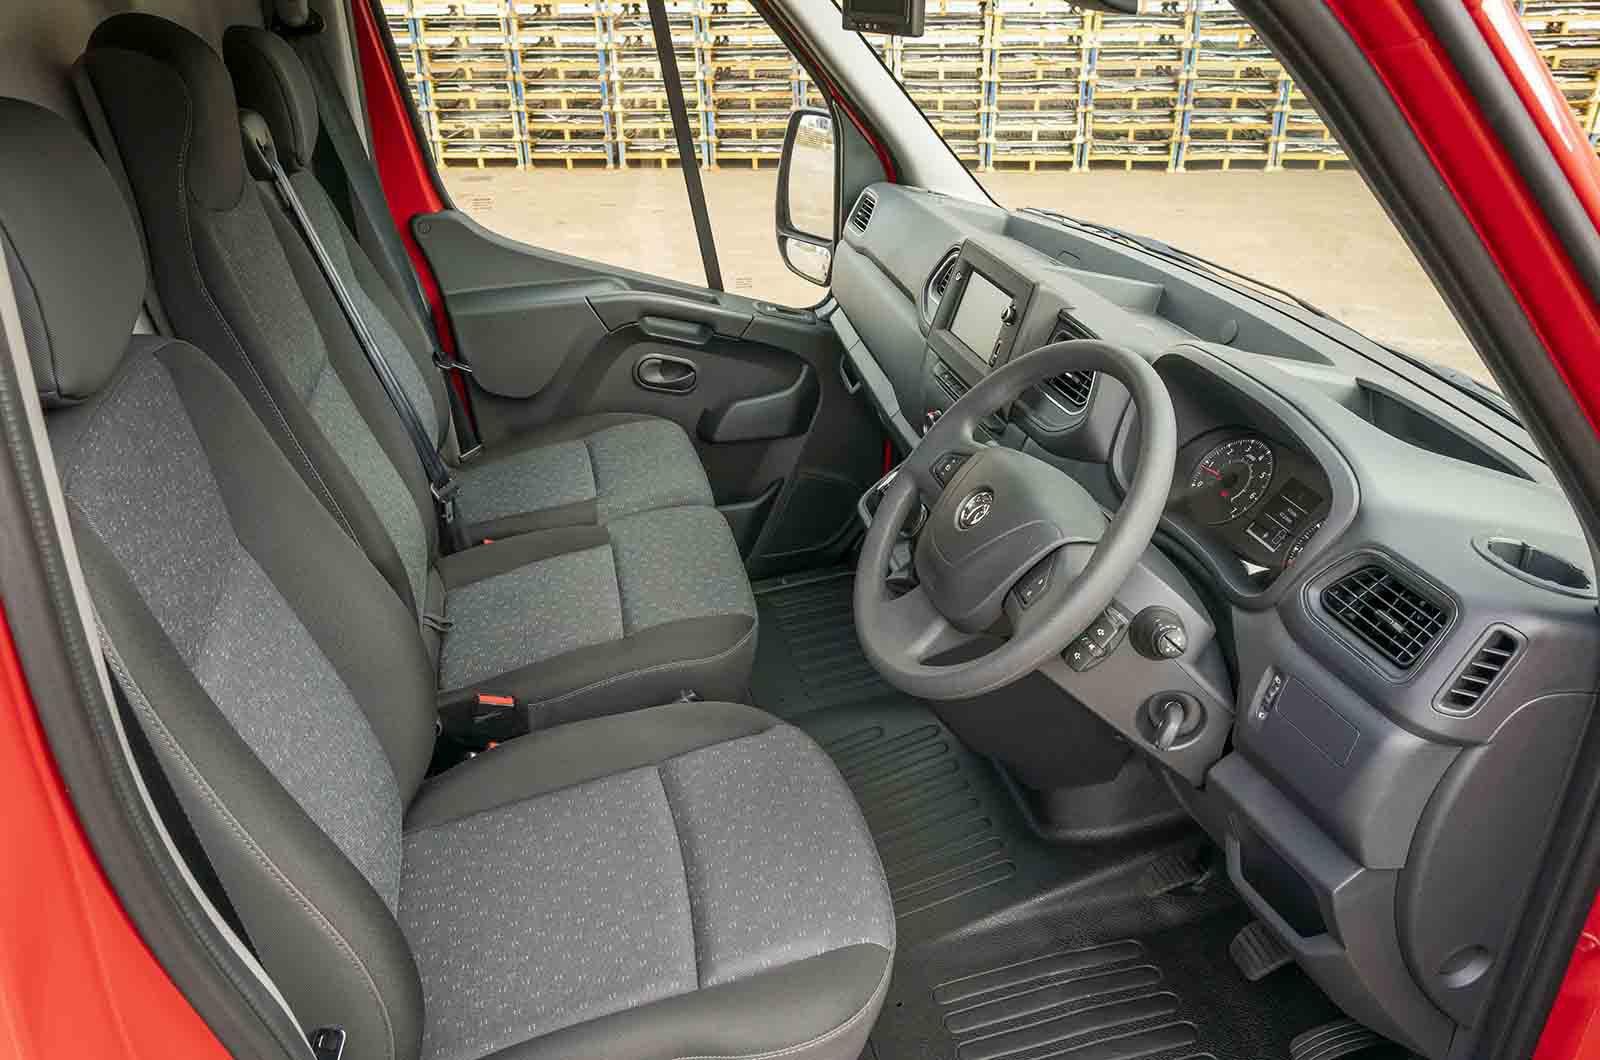 Vauxhall Movano interior